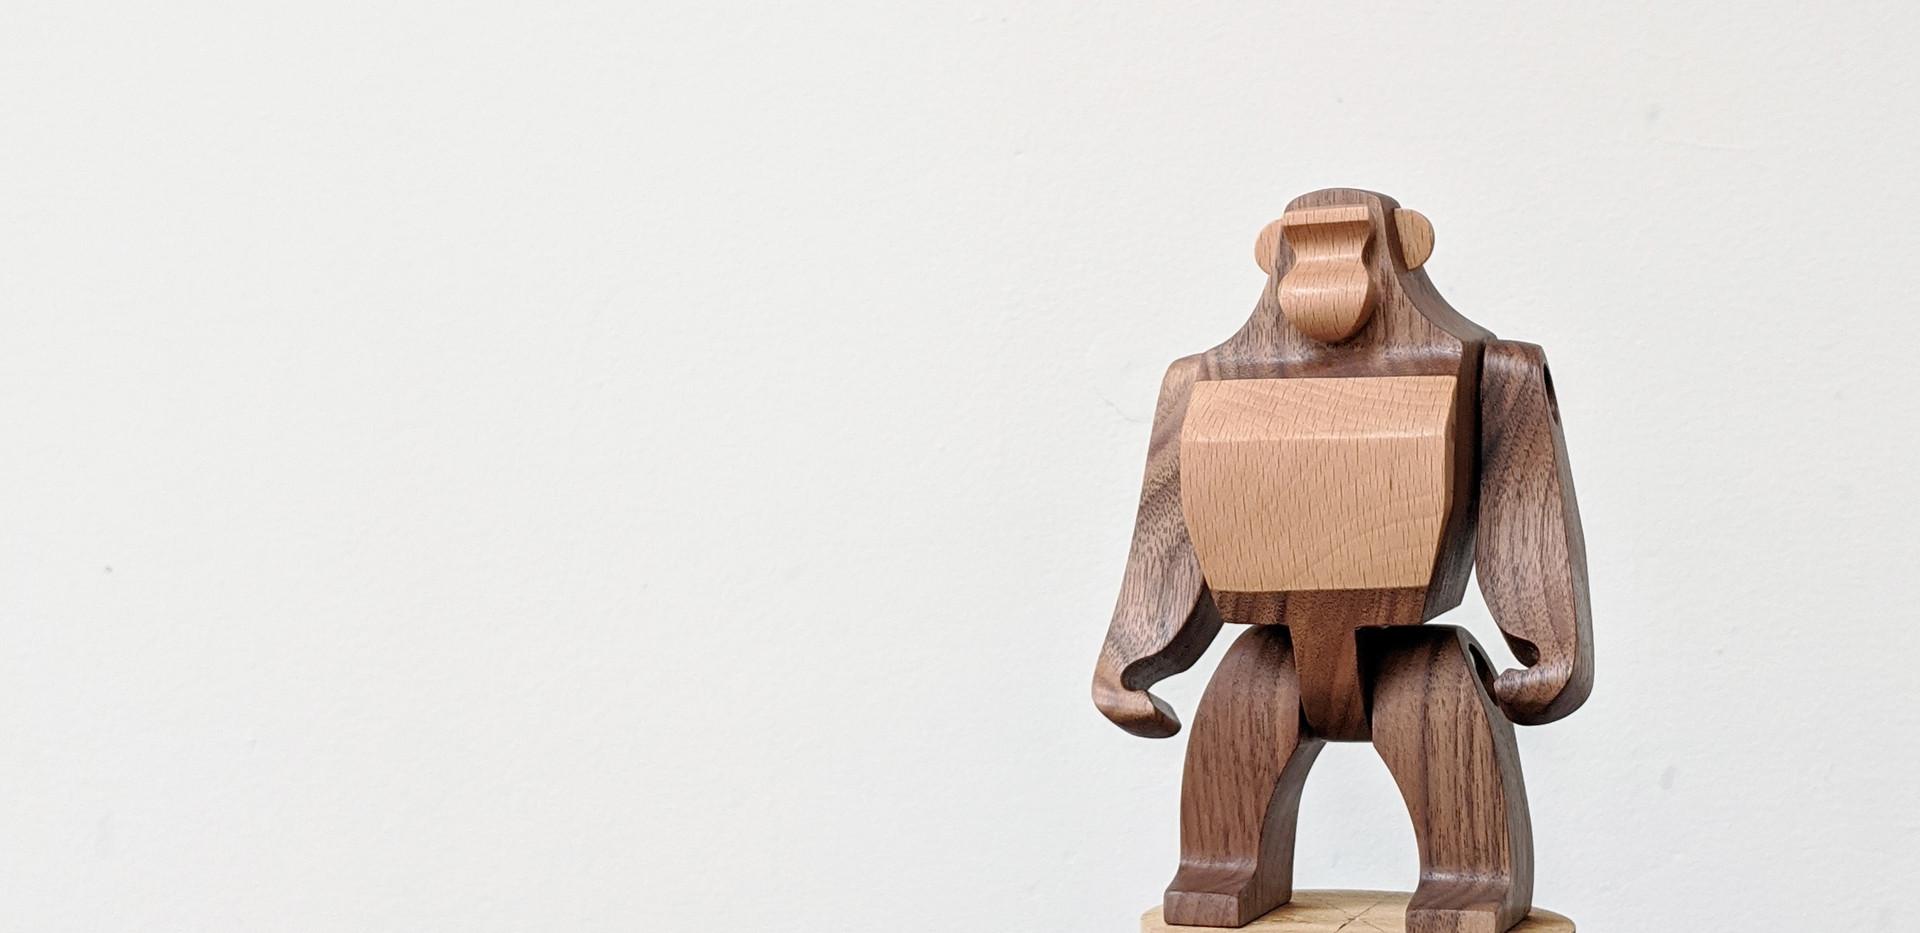 chimp_standing.jpg